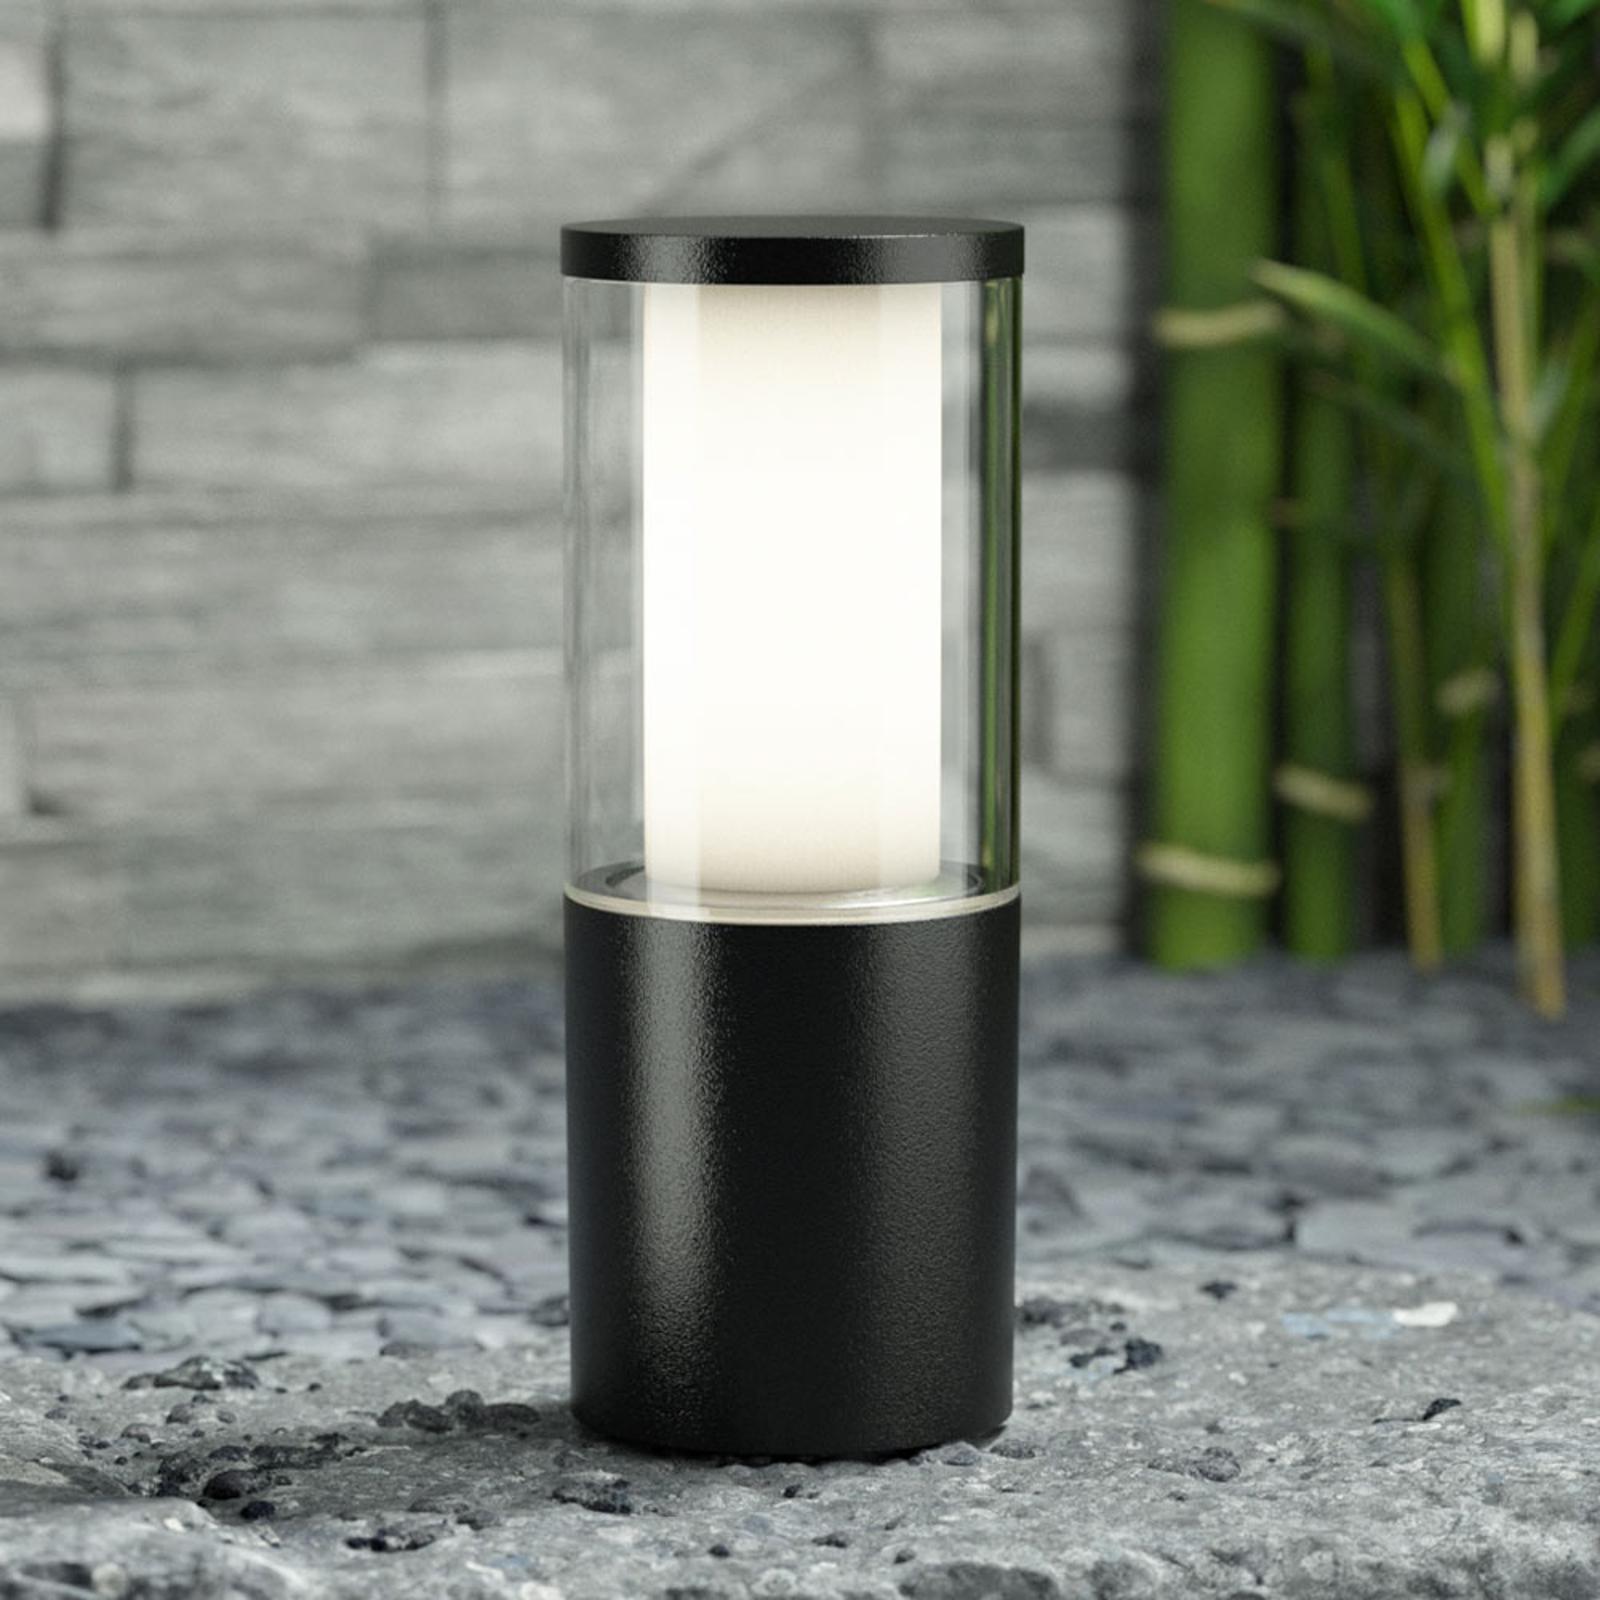 LED-Sockelleuchte Carlo schwarz 3,5W CCT Höhe 25cm